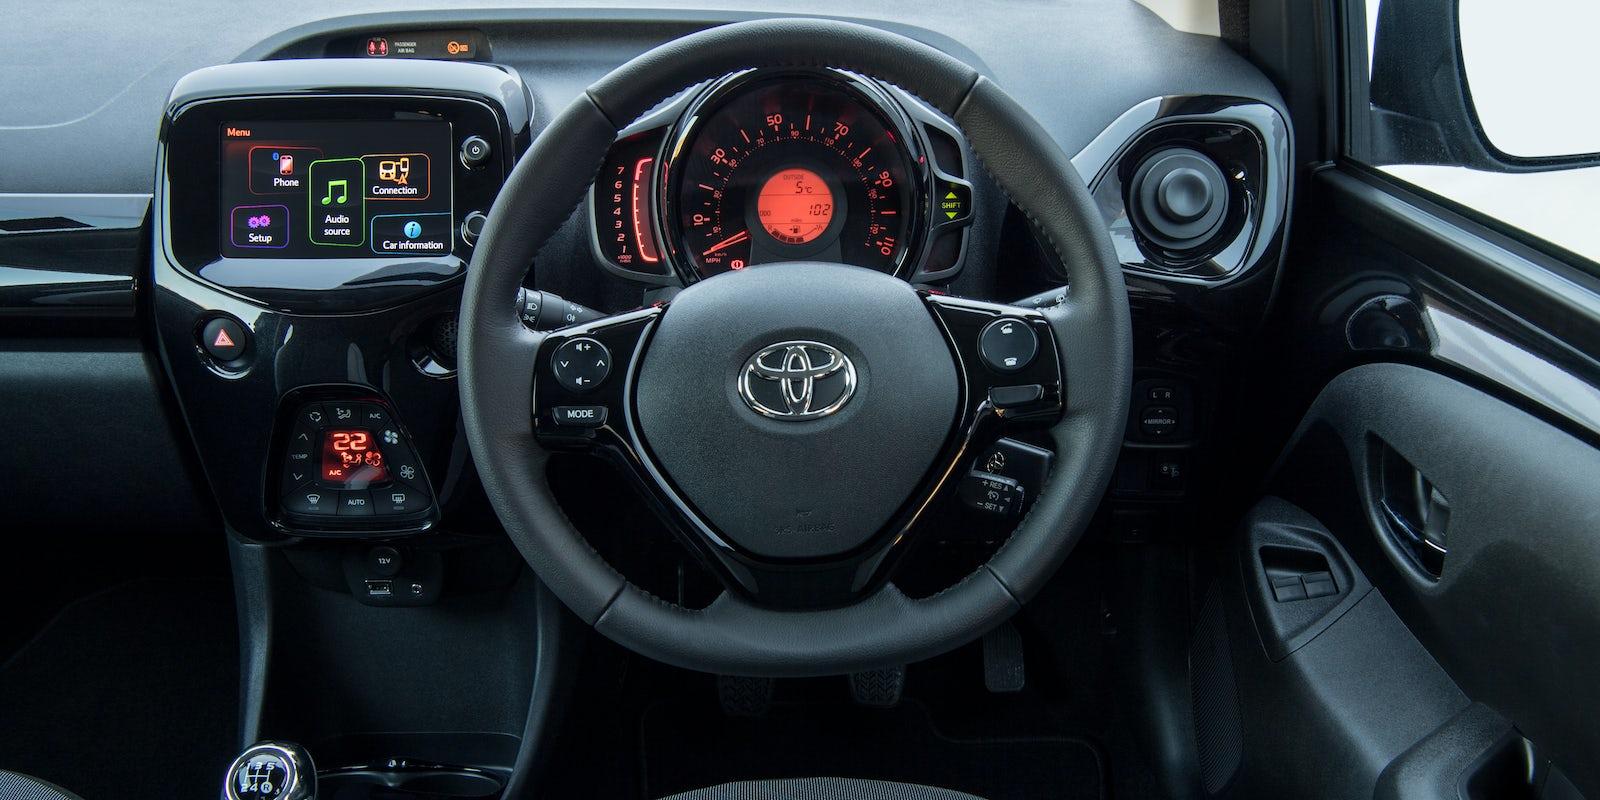 Toyota aygo interior and infotainment carwow - Toyota aygo interior ...